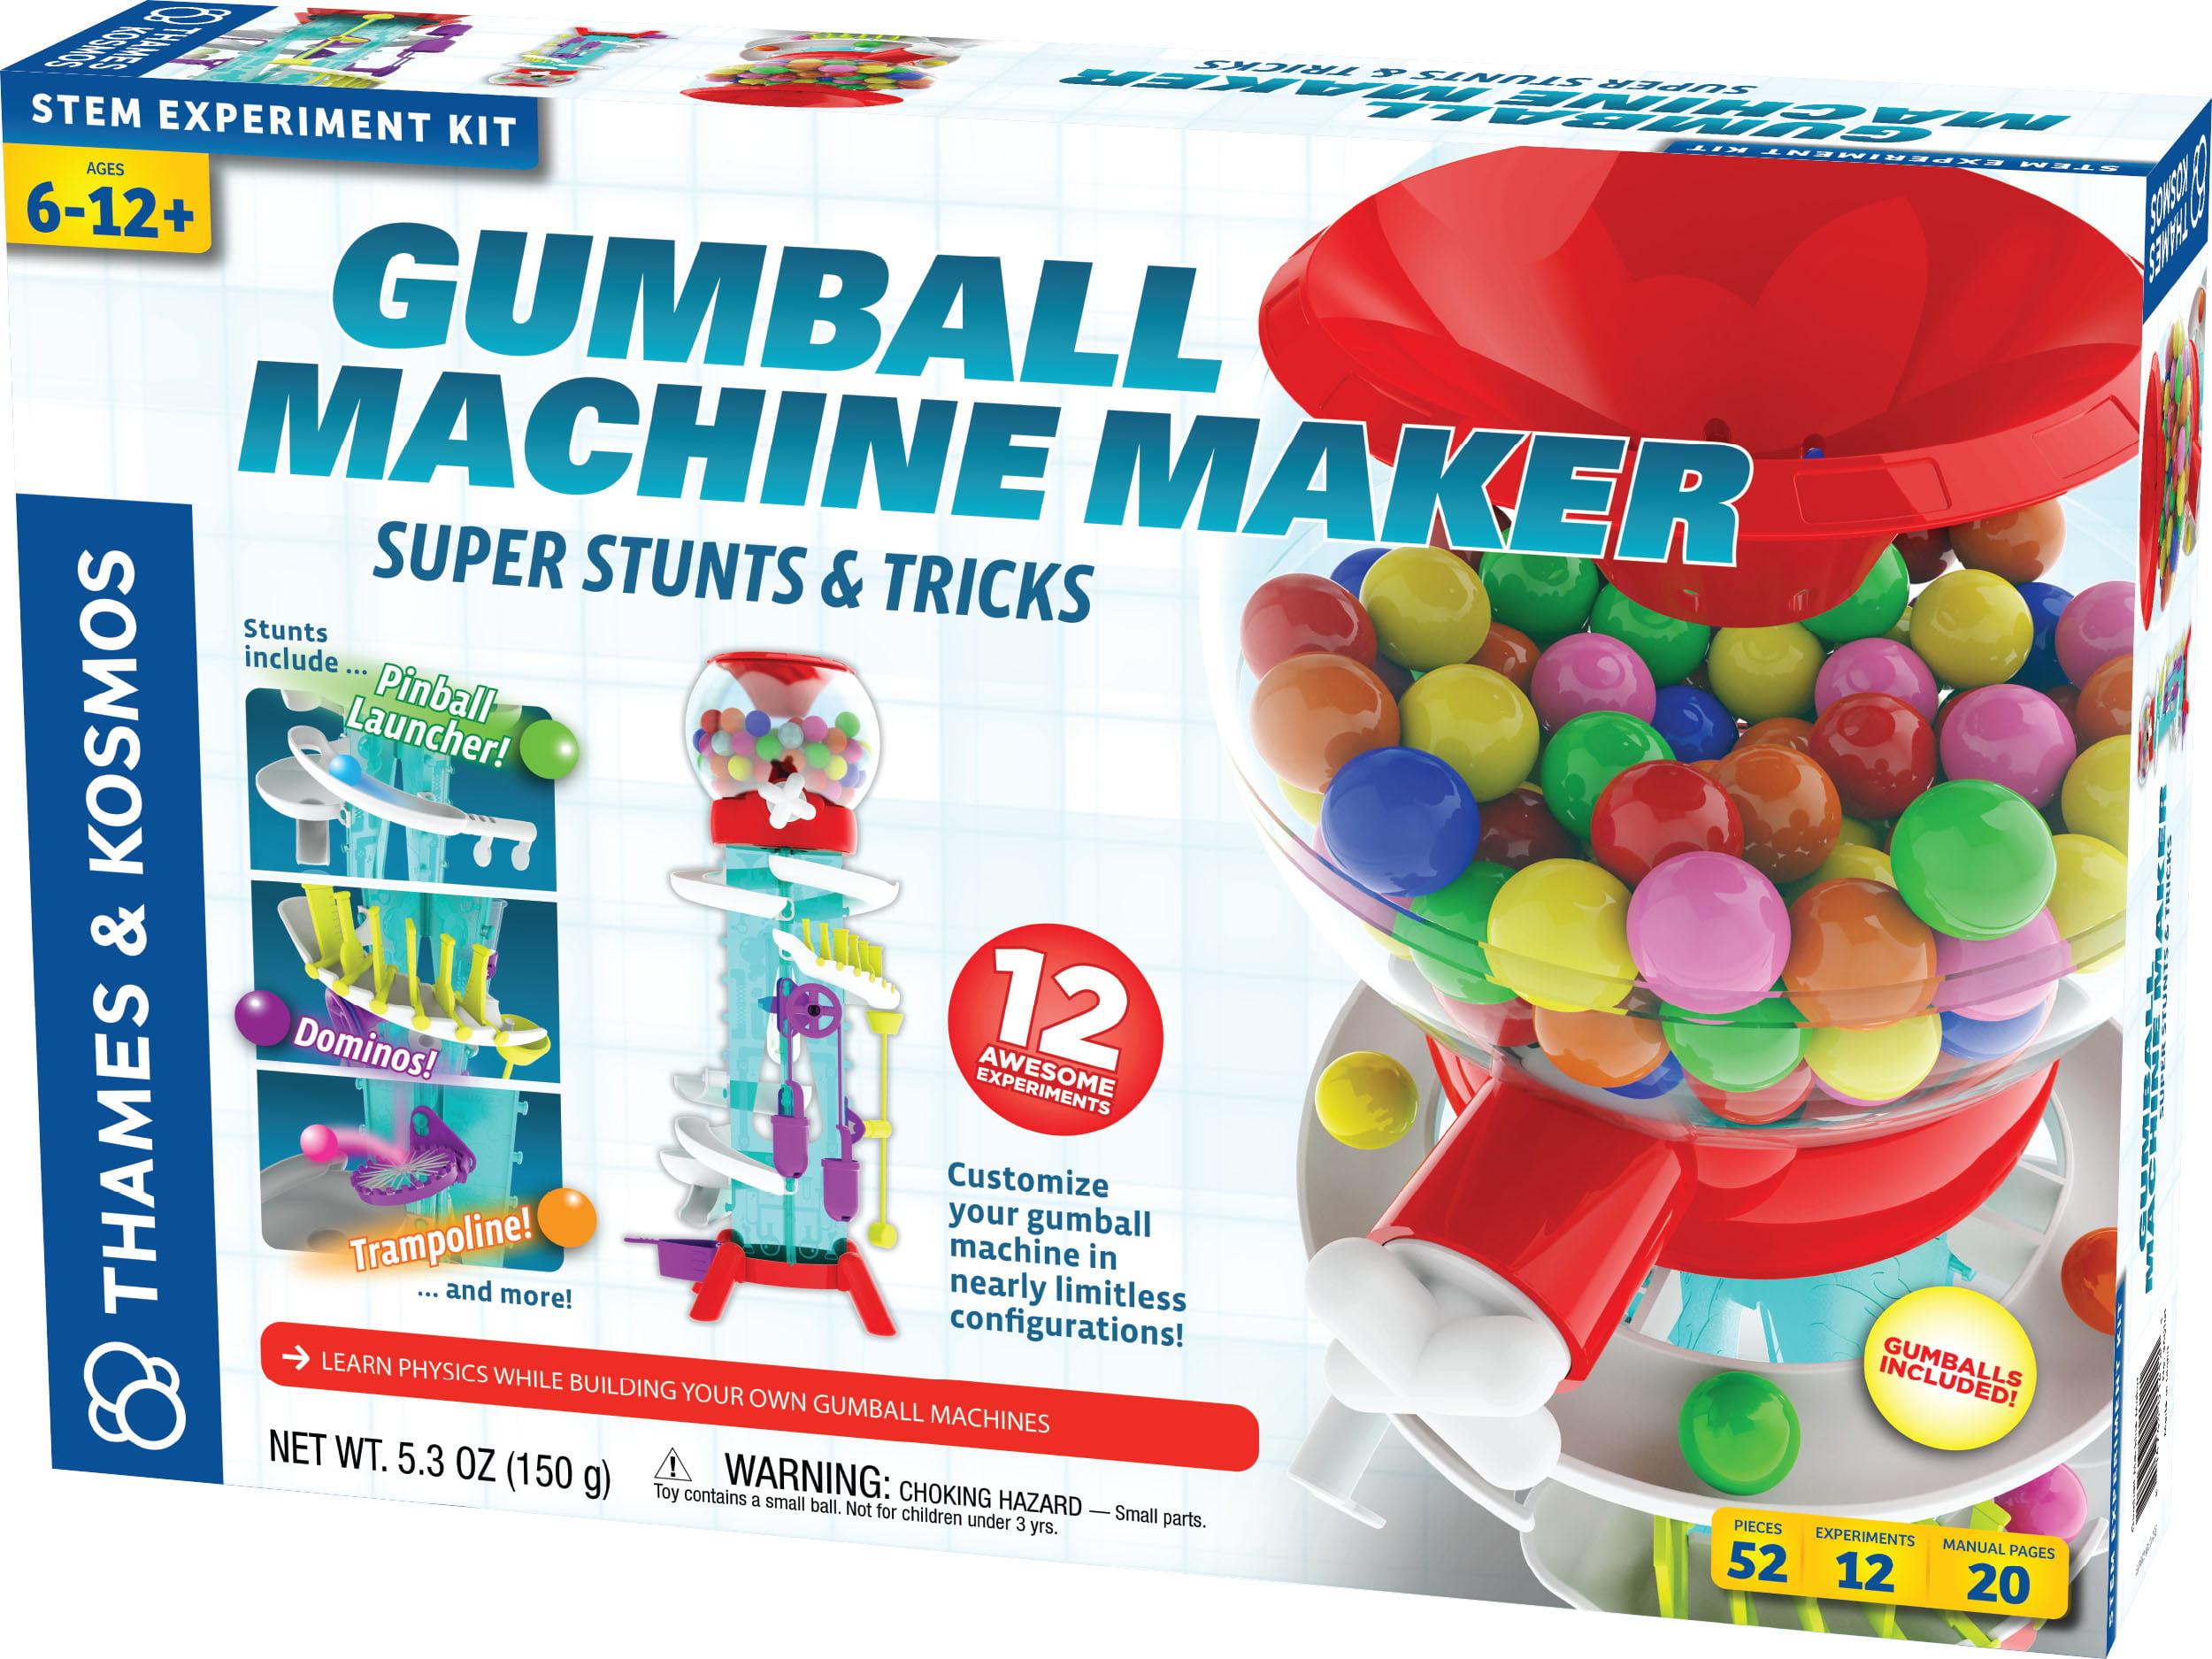 Thames & Kosmos Gumball Machine Maker: Super Stunts & Tricks